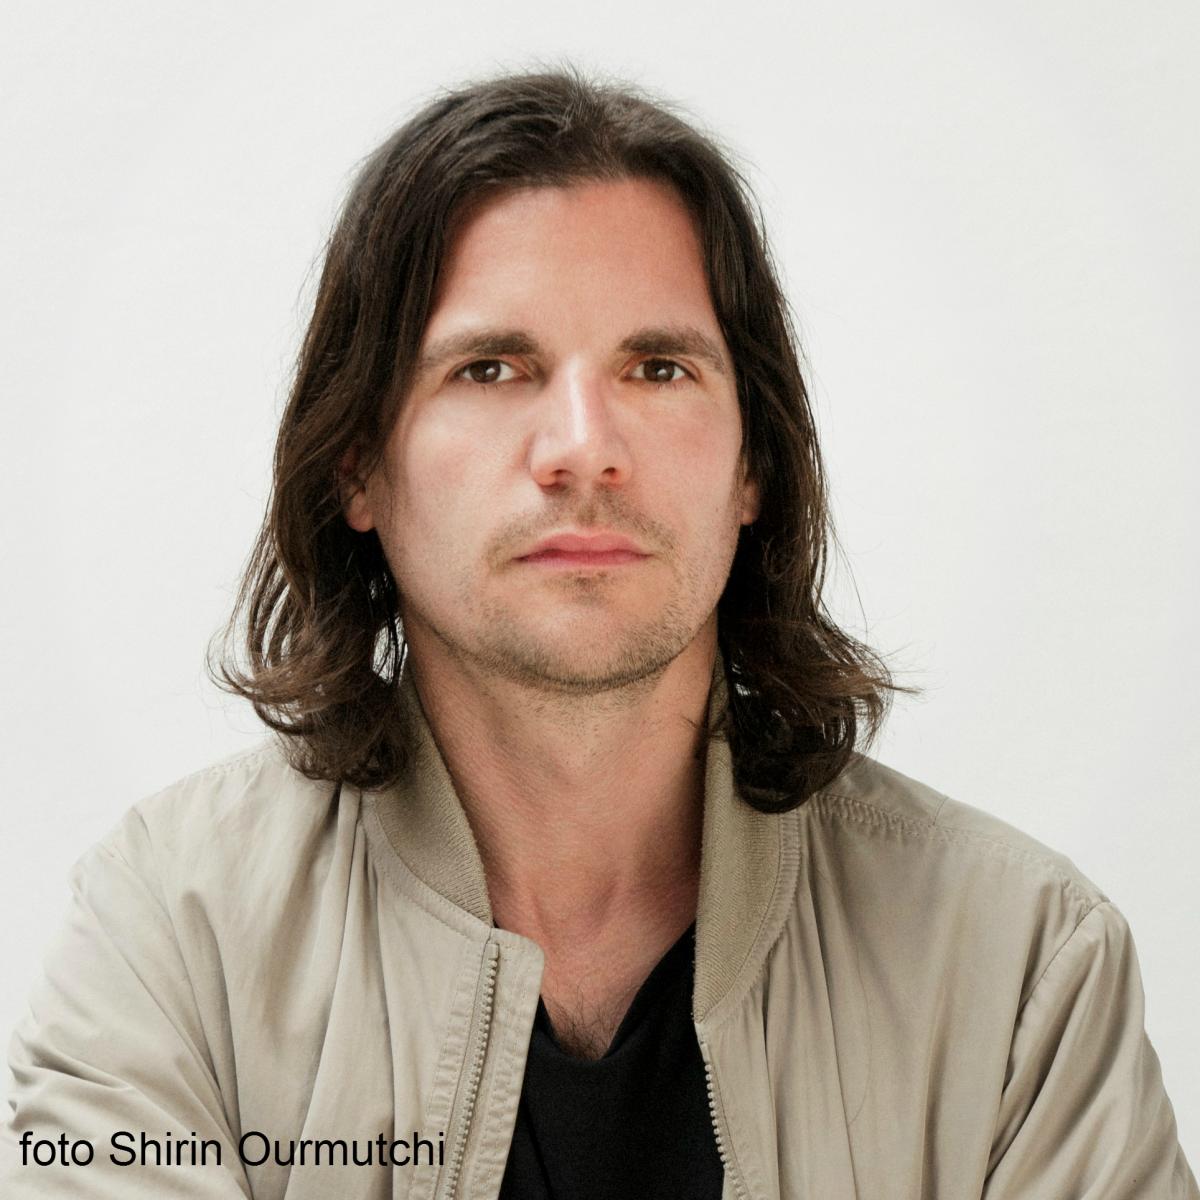 Portretfoto Michael Sailstorfer Door Shirin Ourmutchi.